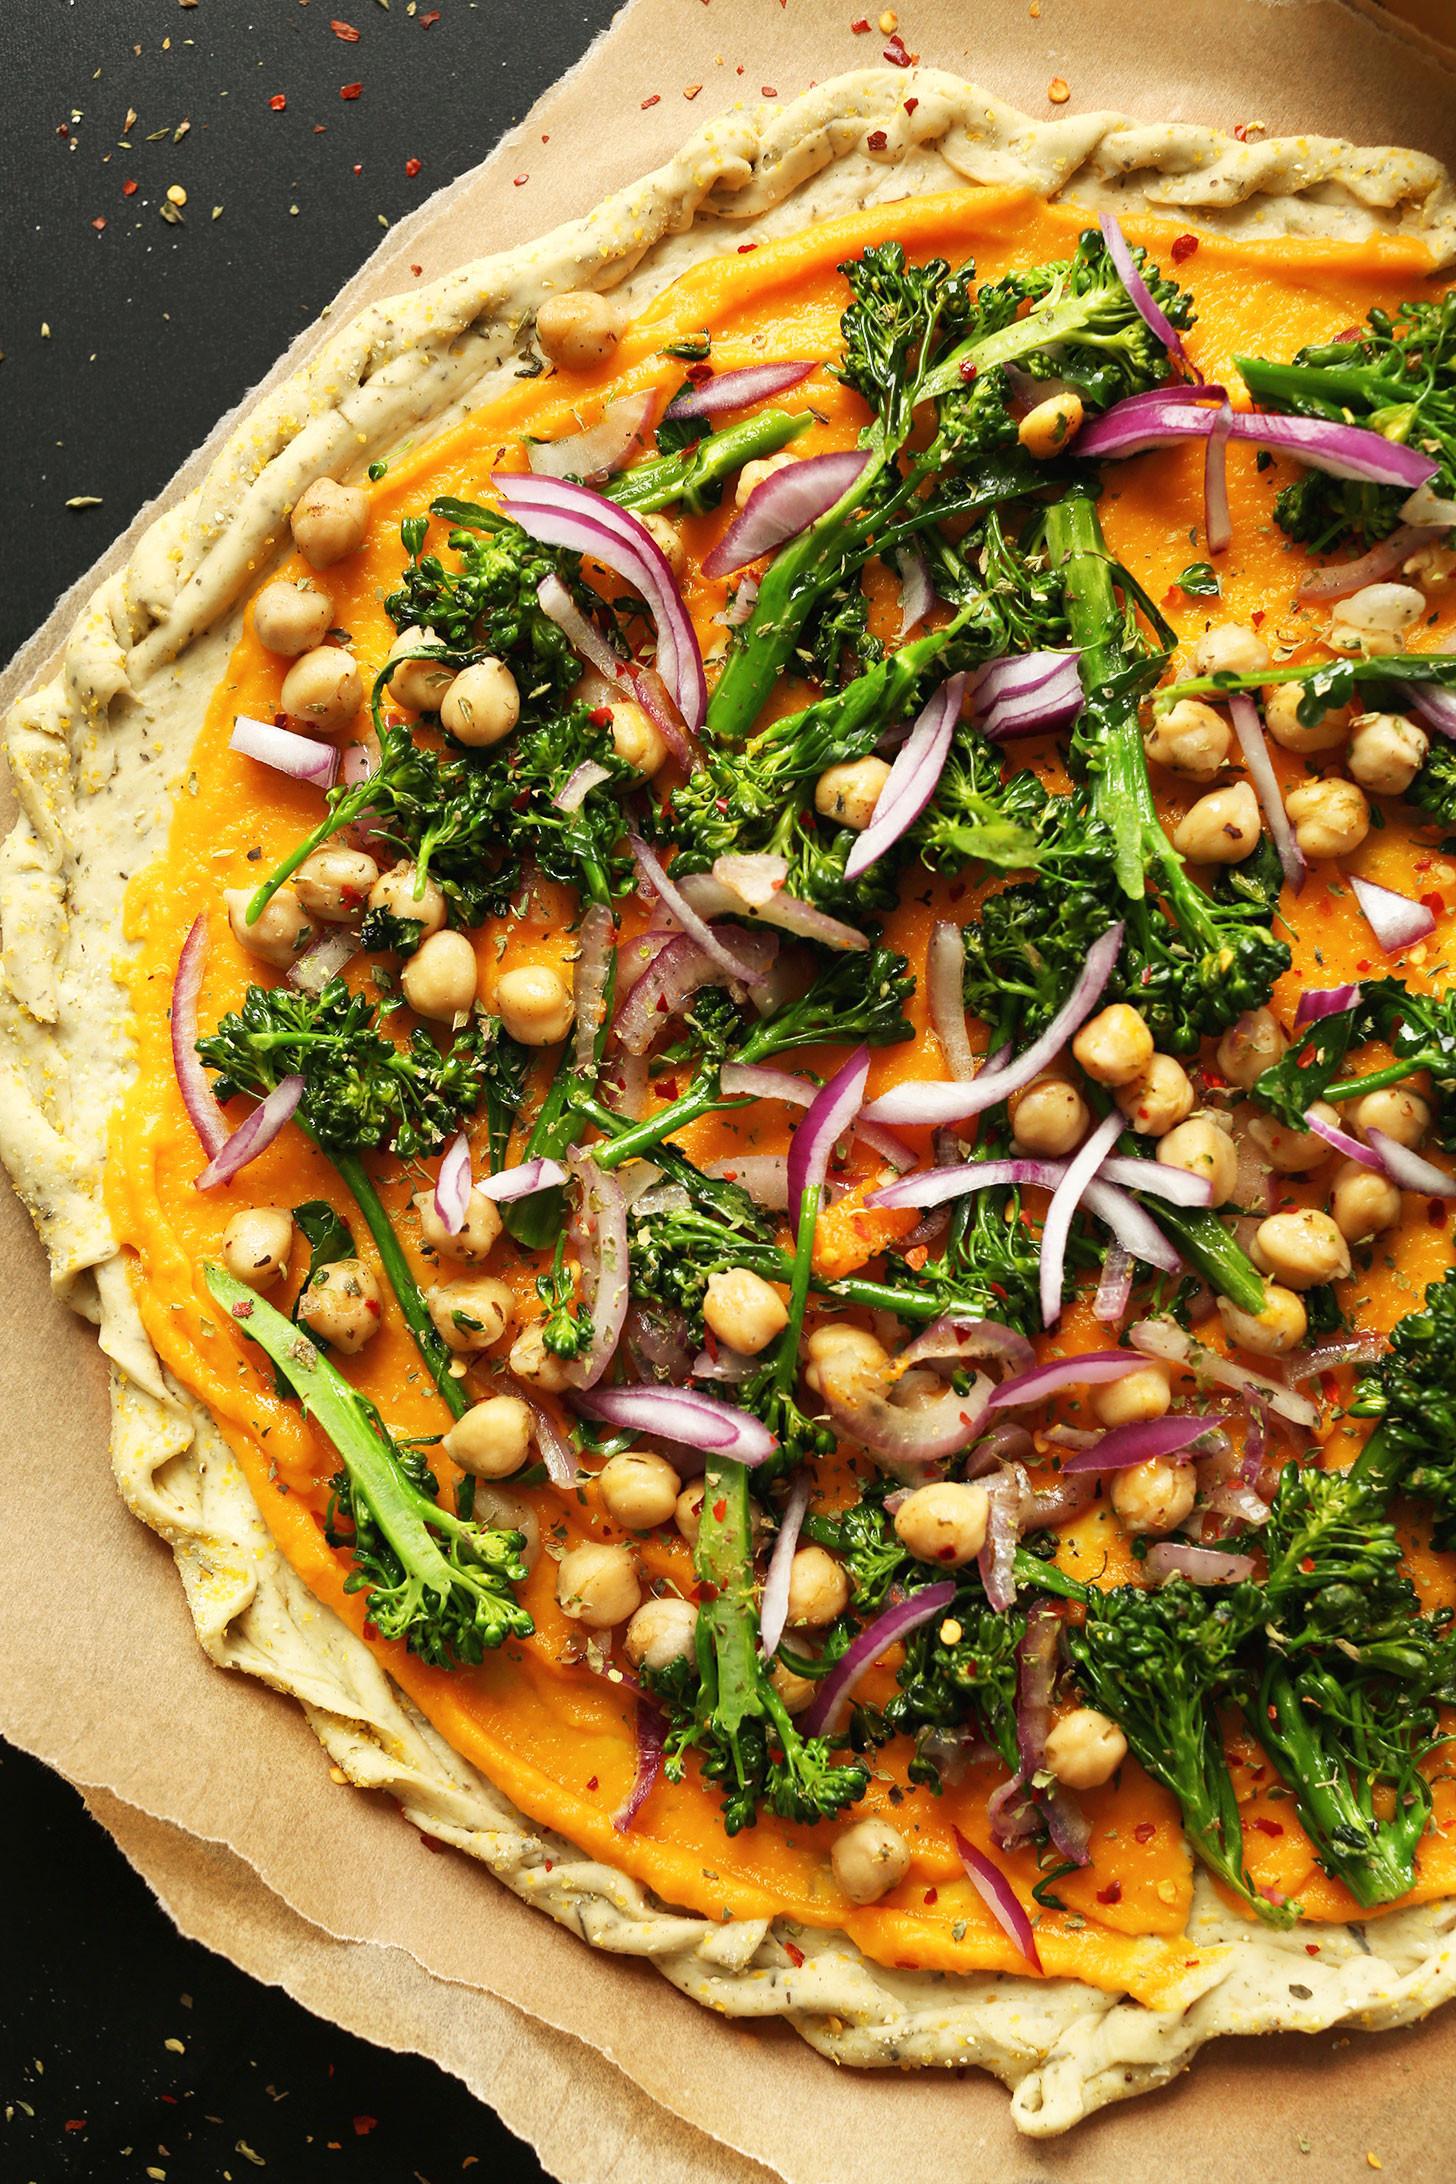 Healthy Tasty Vegetarian Recipes  Ultimate Vegan Pizza Recipe Round Up